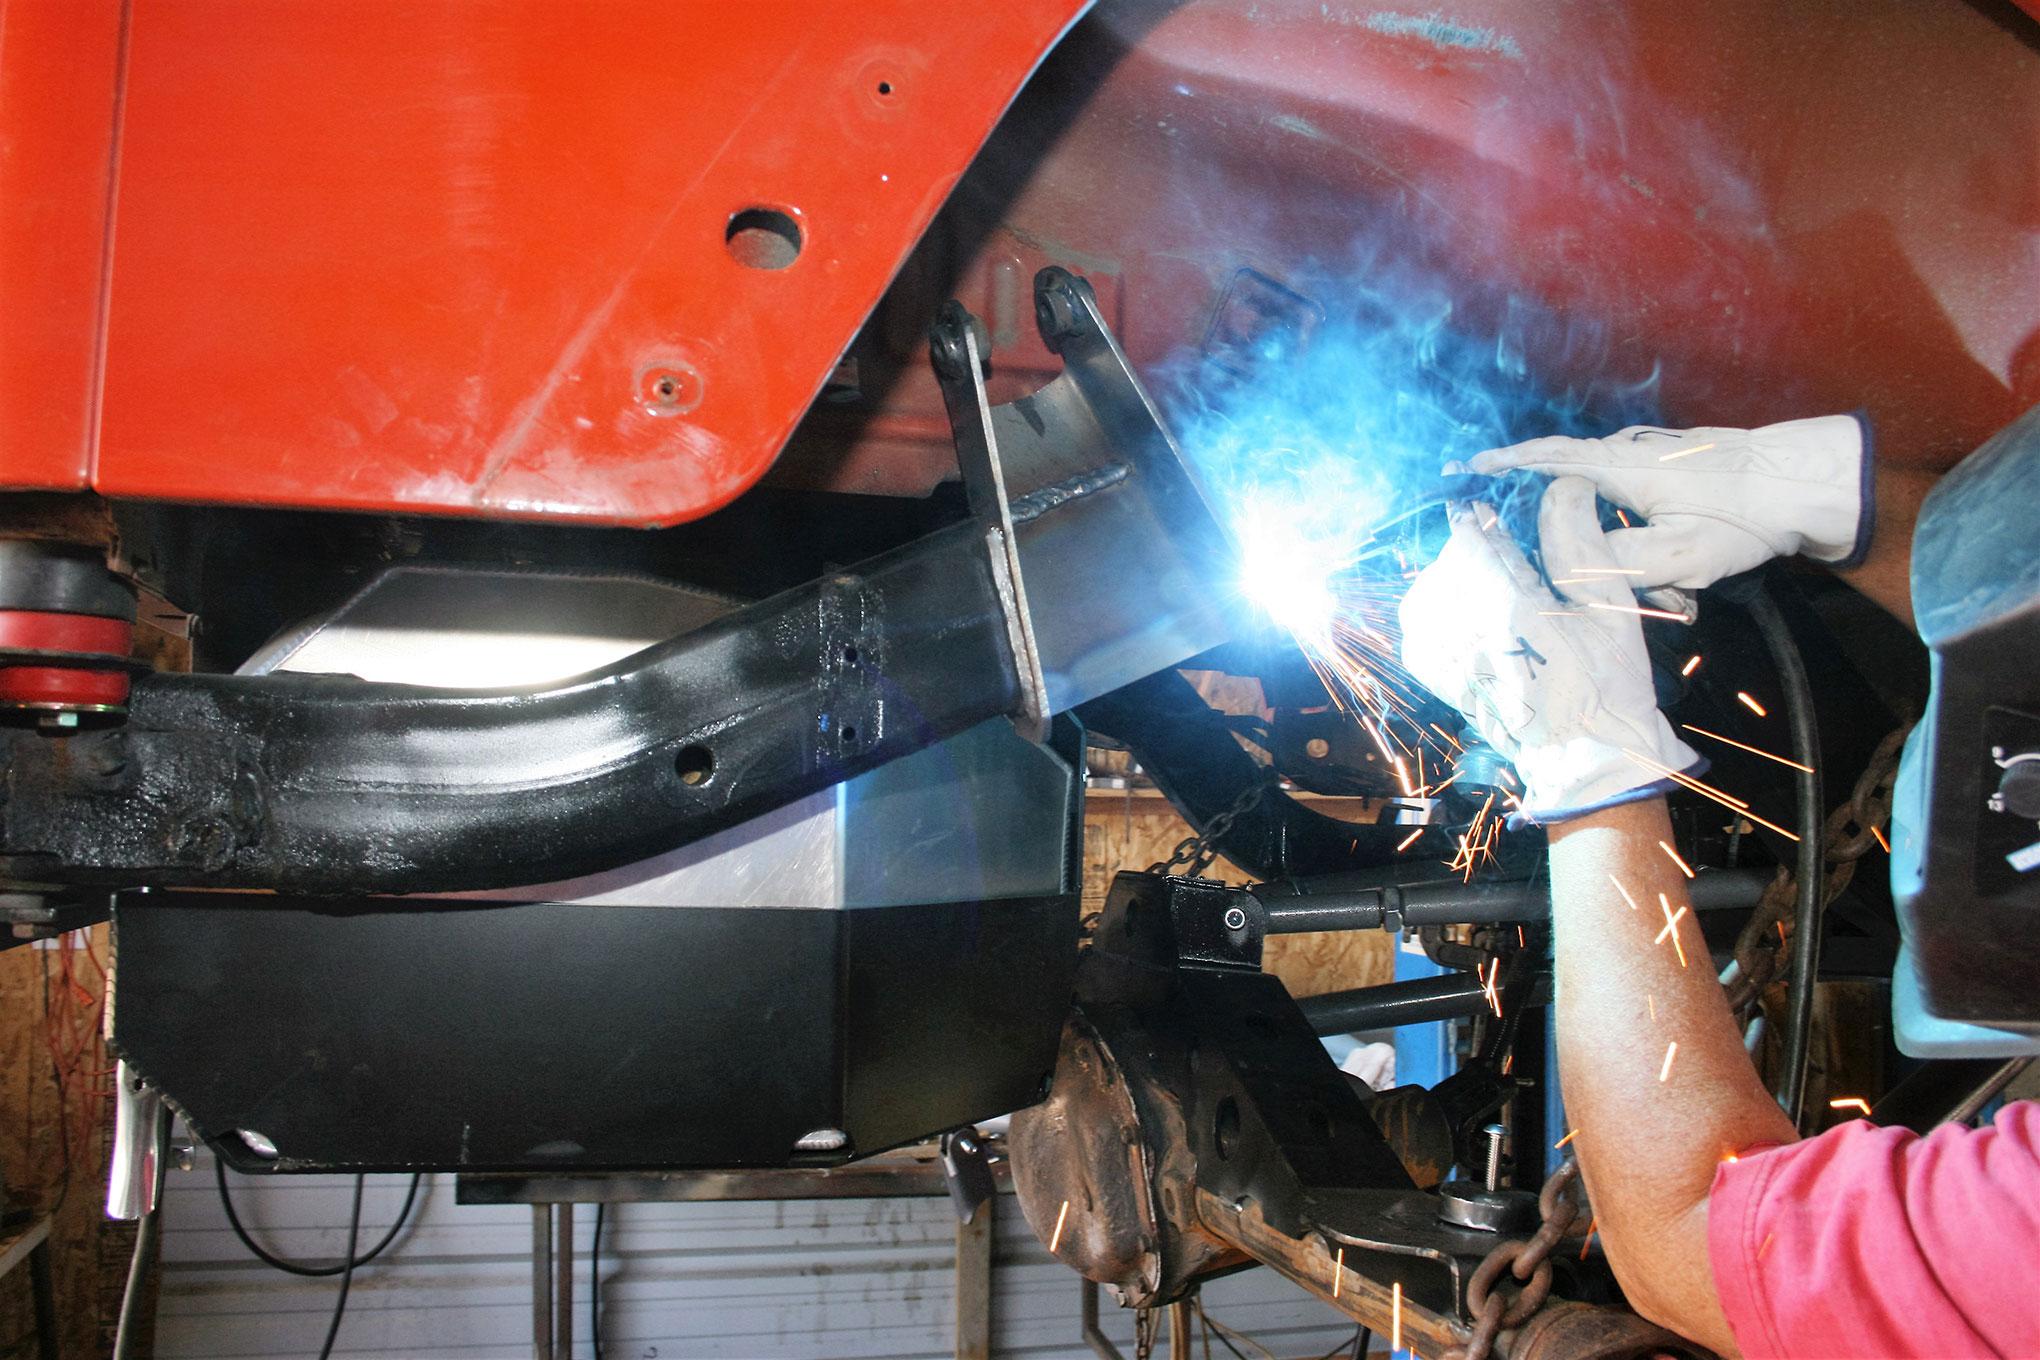 057 2005 rubicon suspension upper mount welded frame